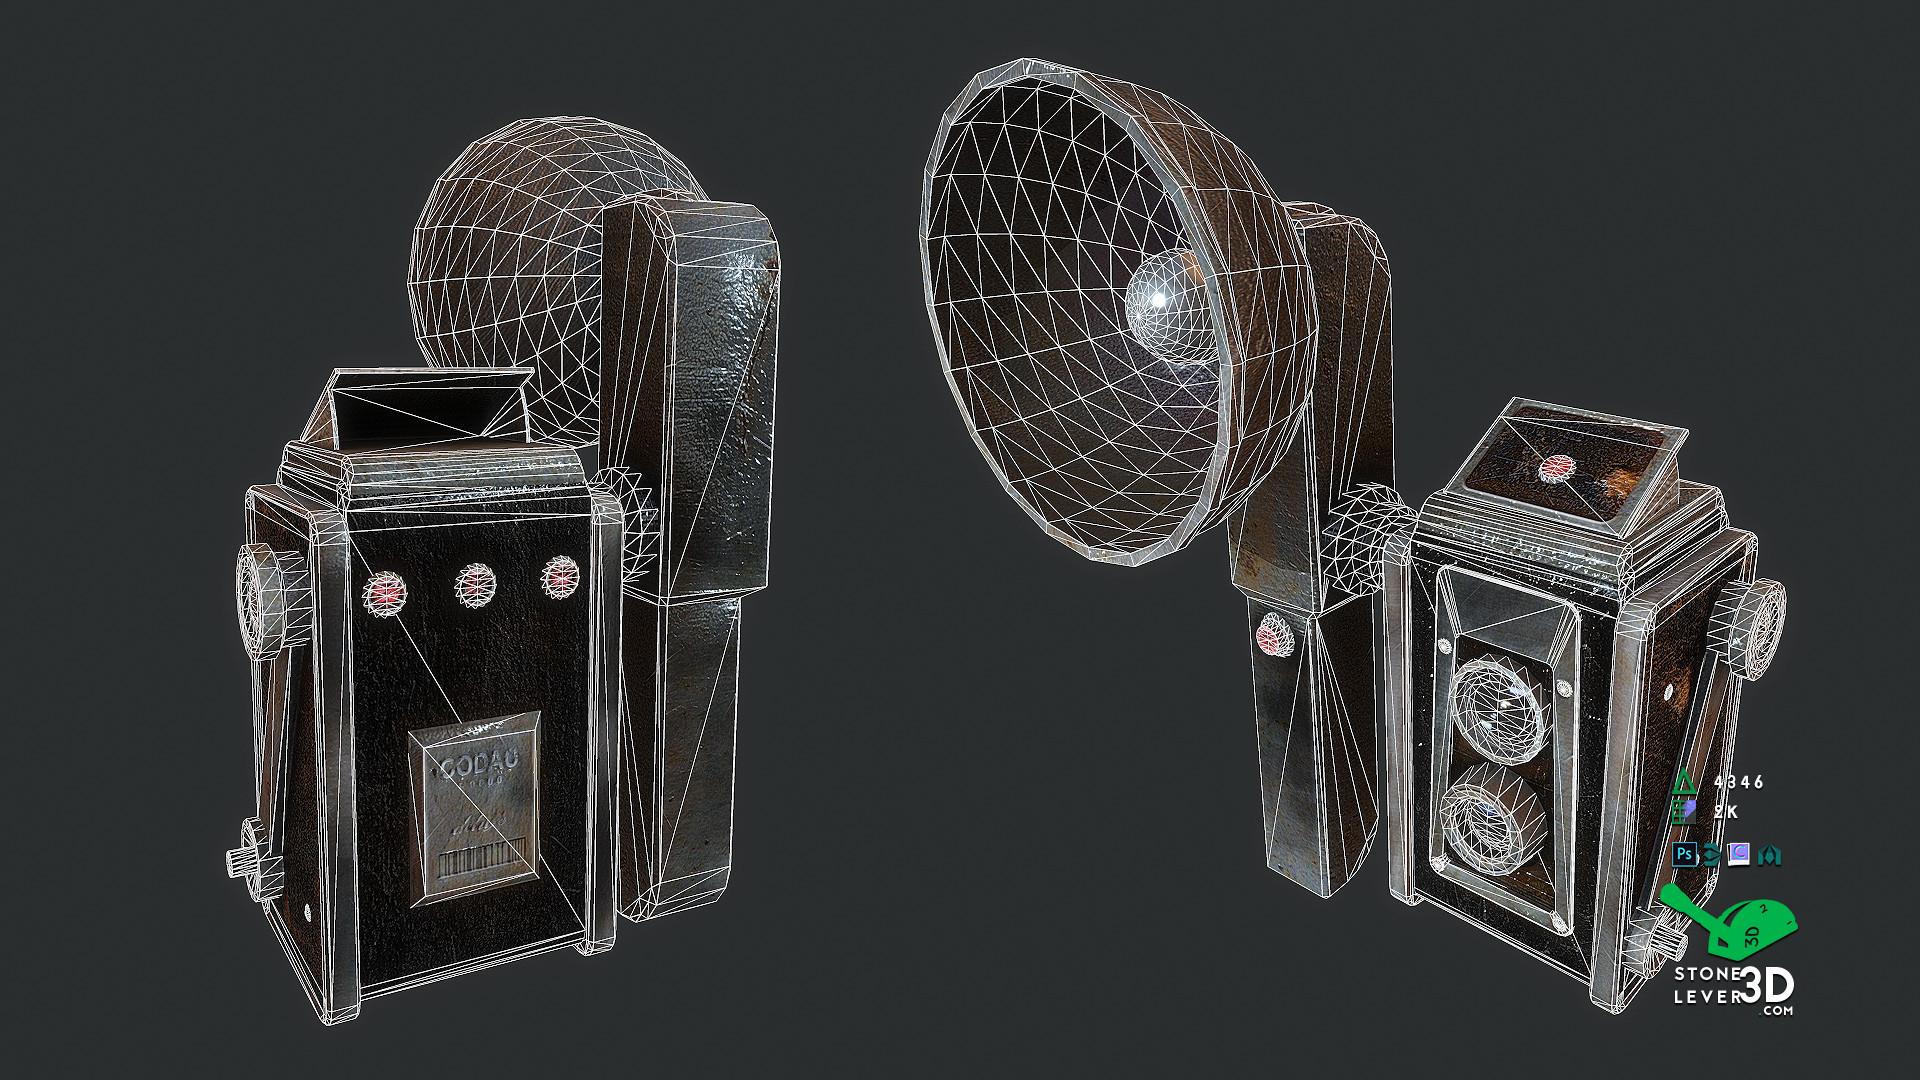 """Codac-R9000"" Prop Model Replica - Wireframe"